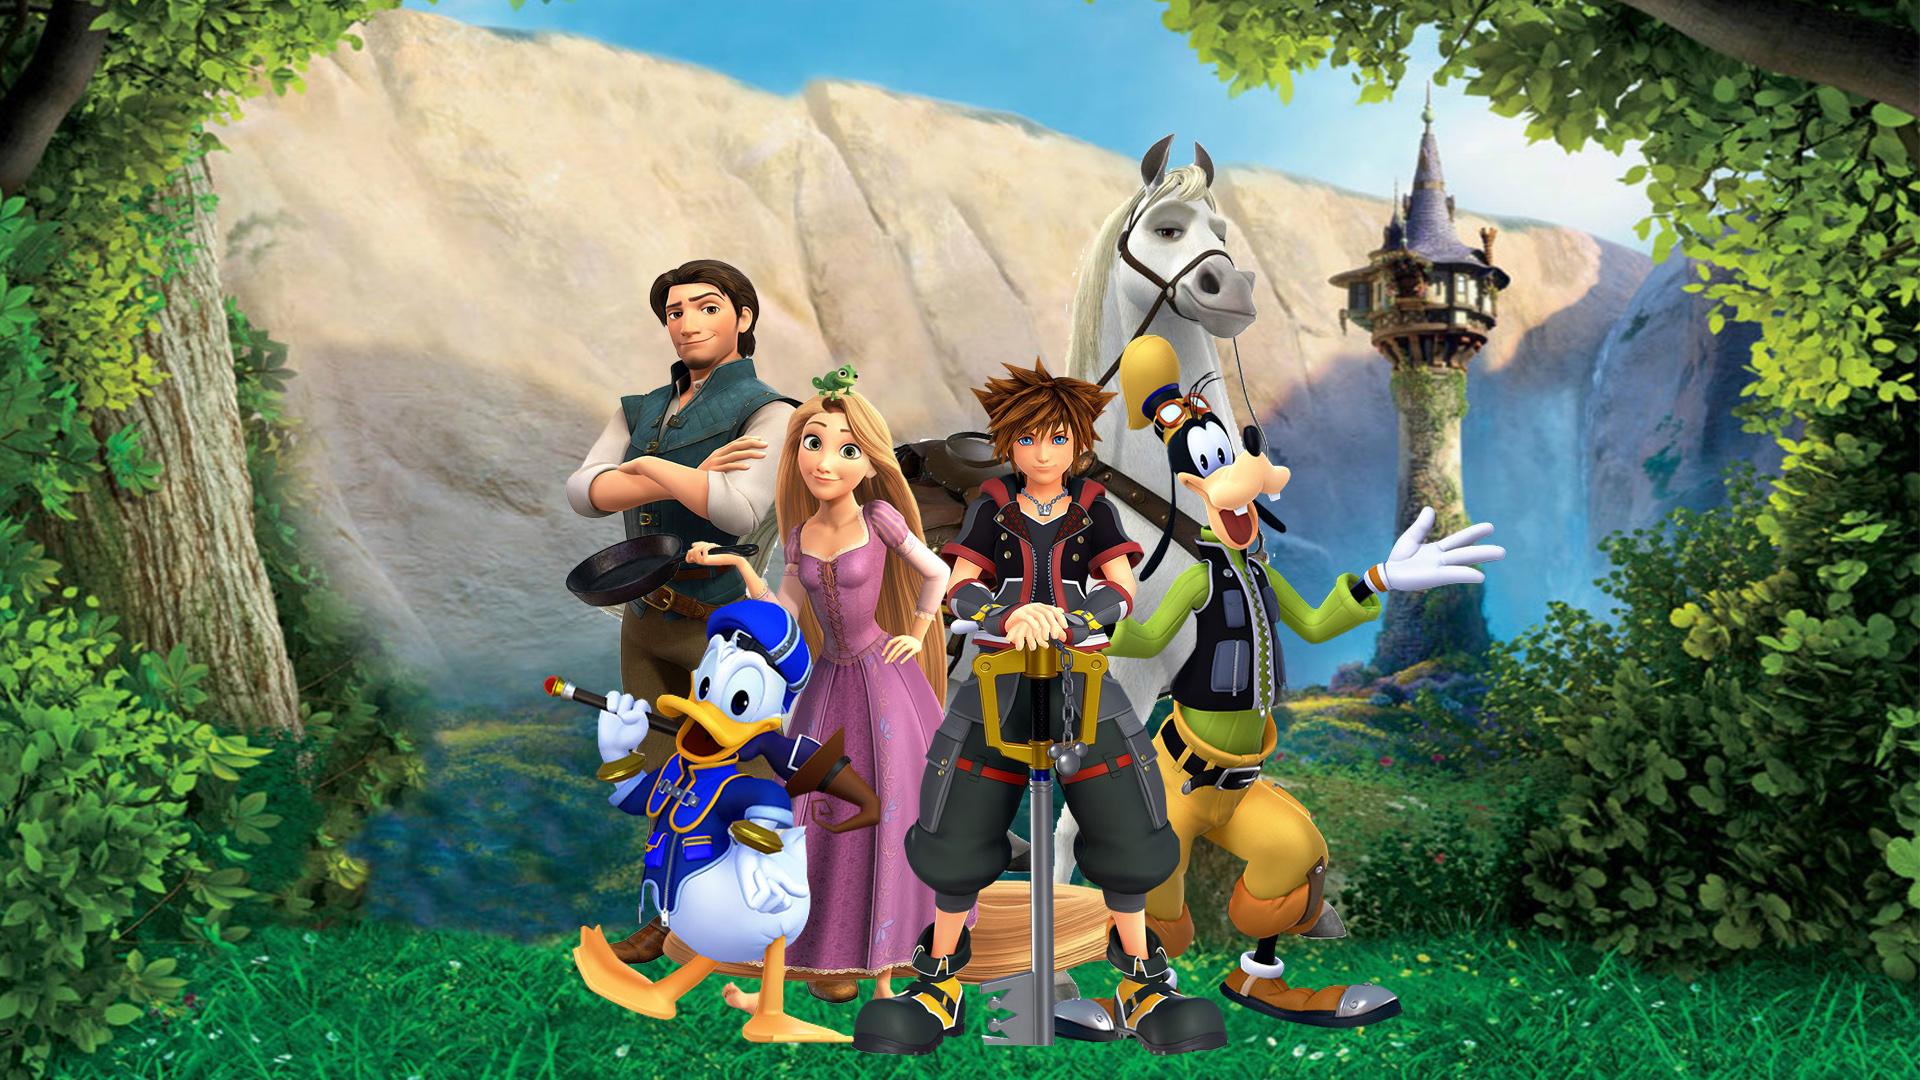 Kingdom Hearts III -Tangled Wallpaper